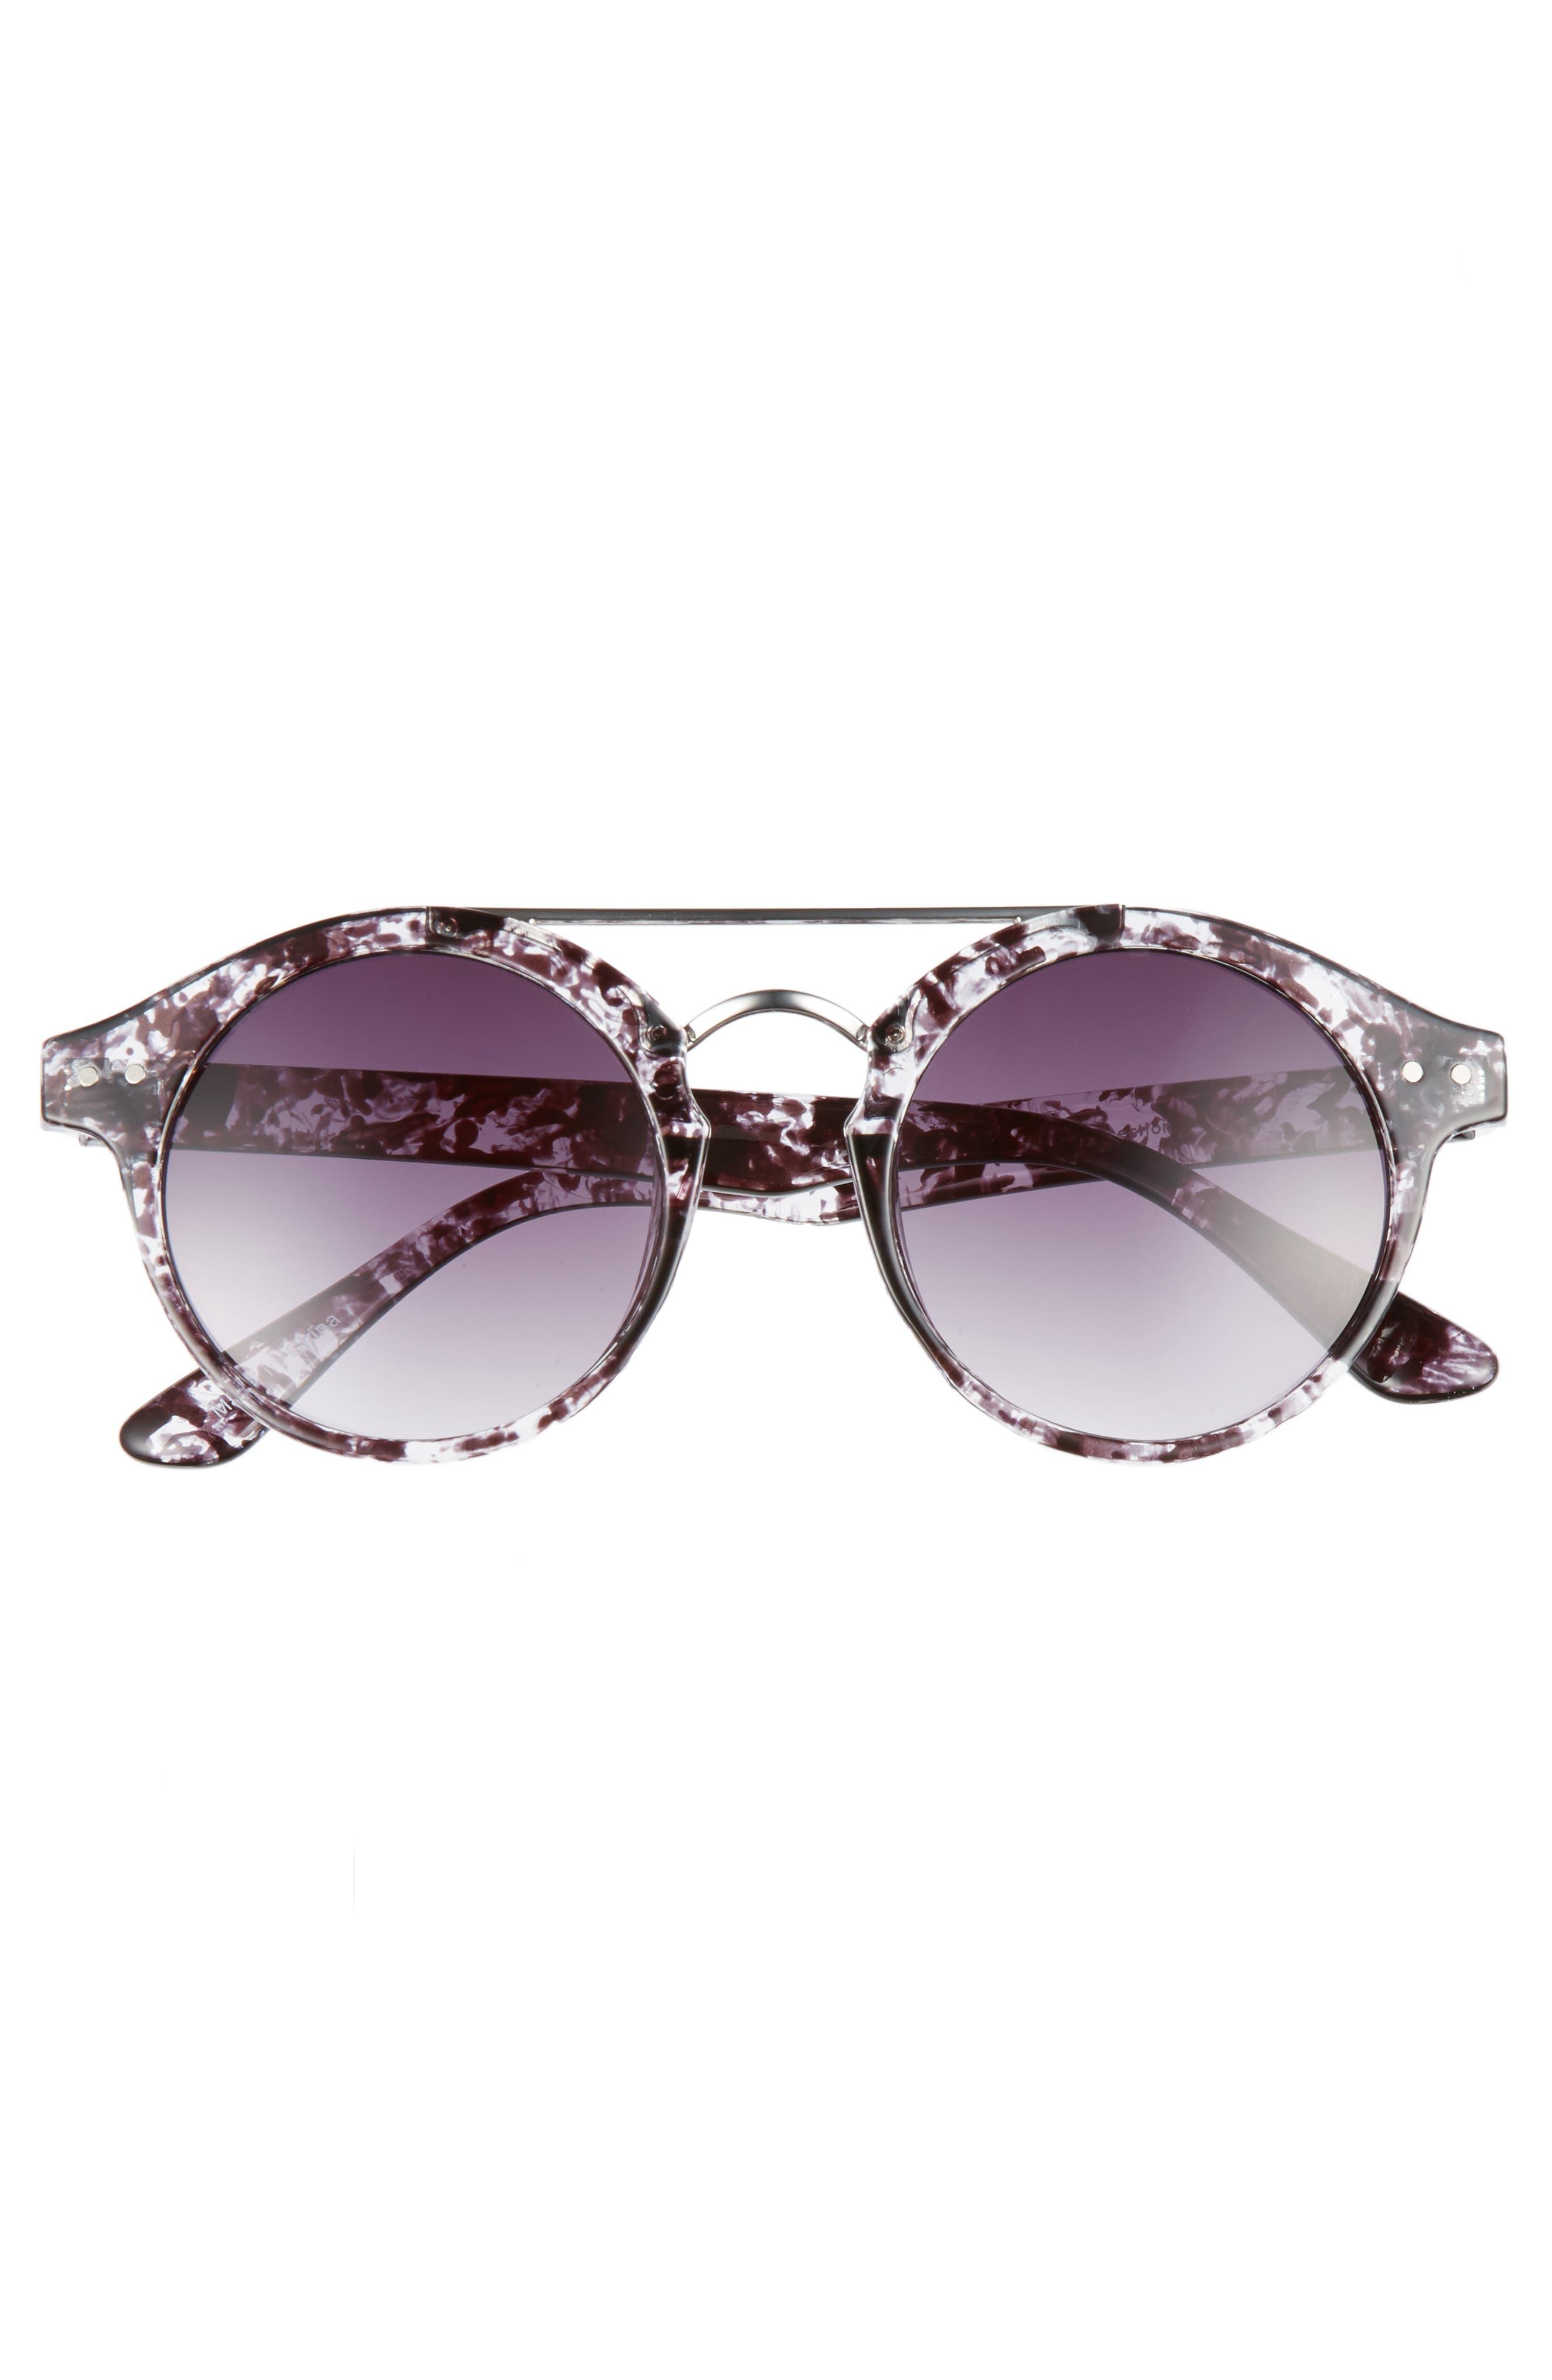 45mm Round Sunglasses,                             Alternate thumbnail 3, color,                             001